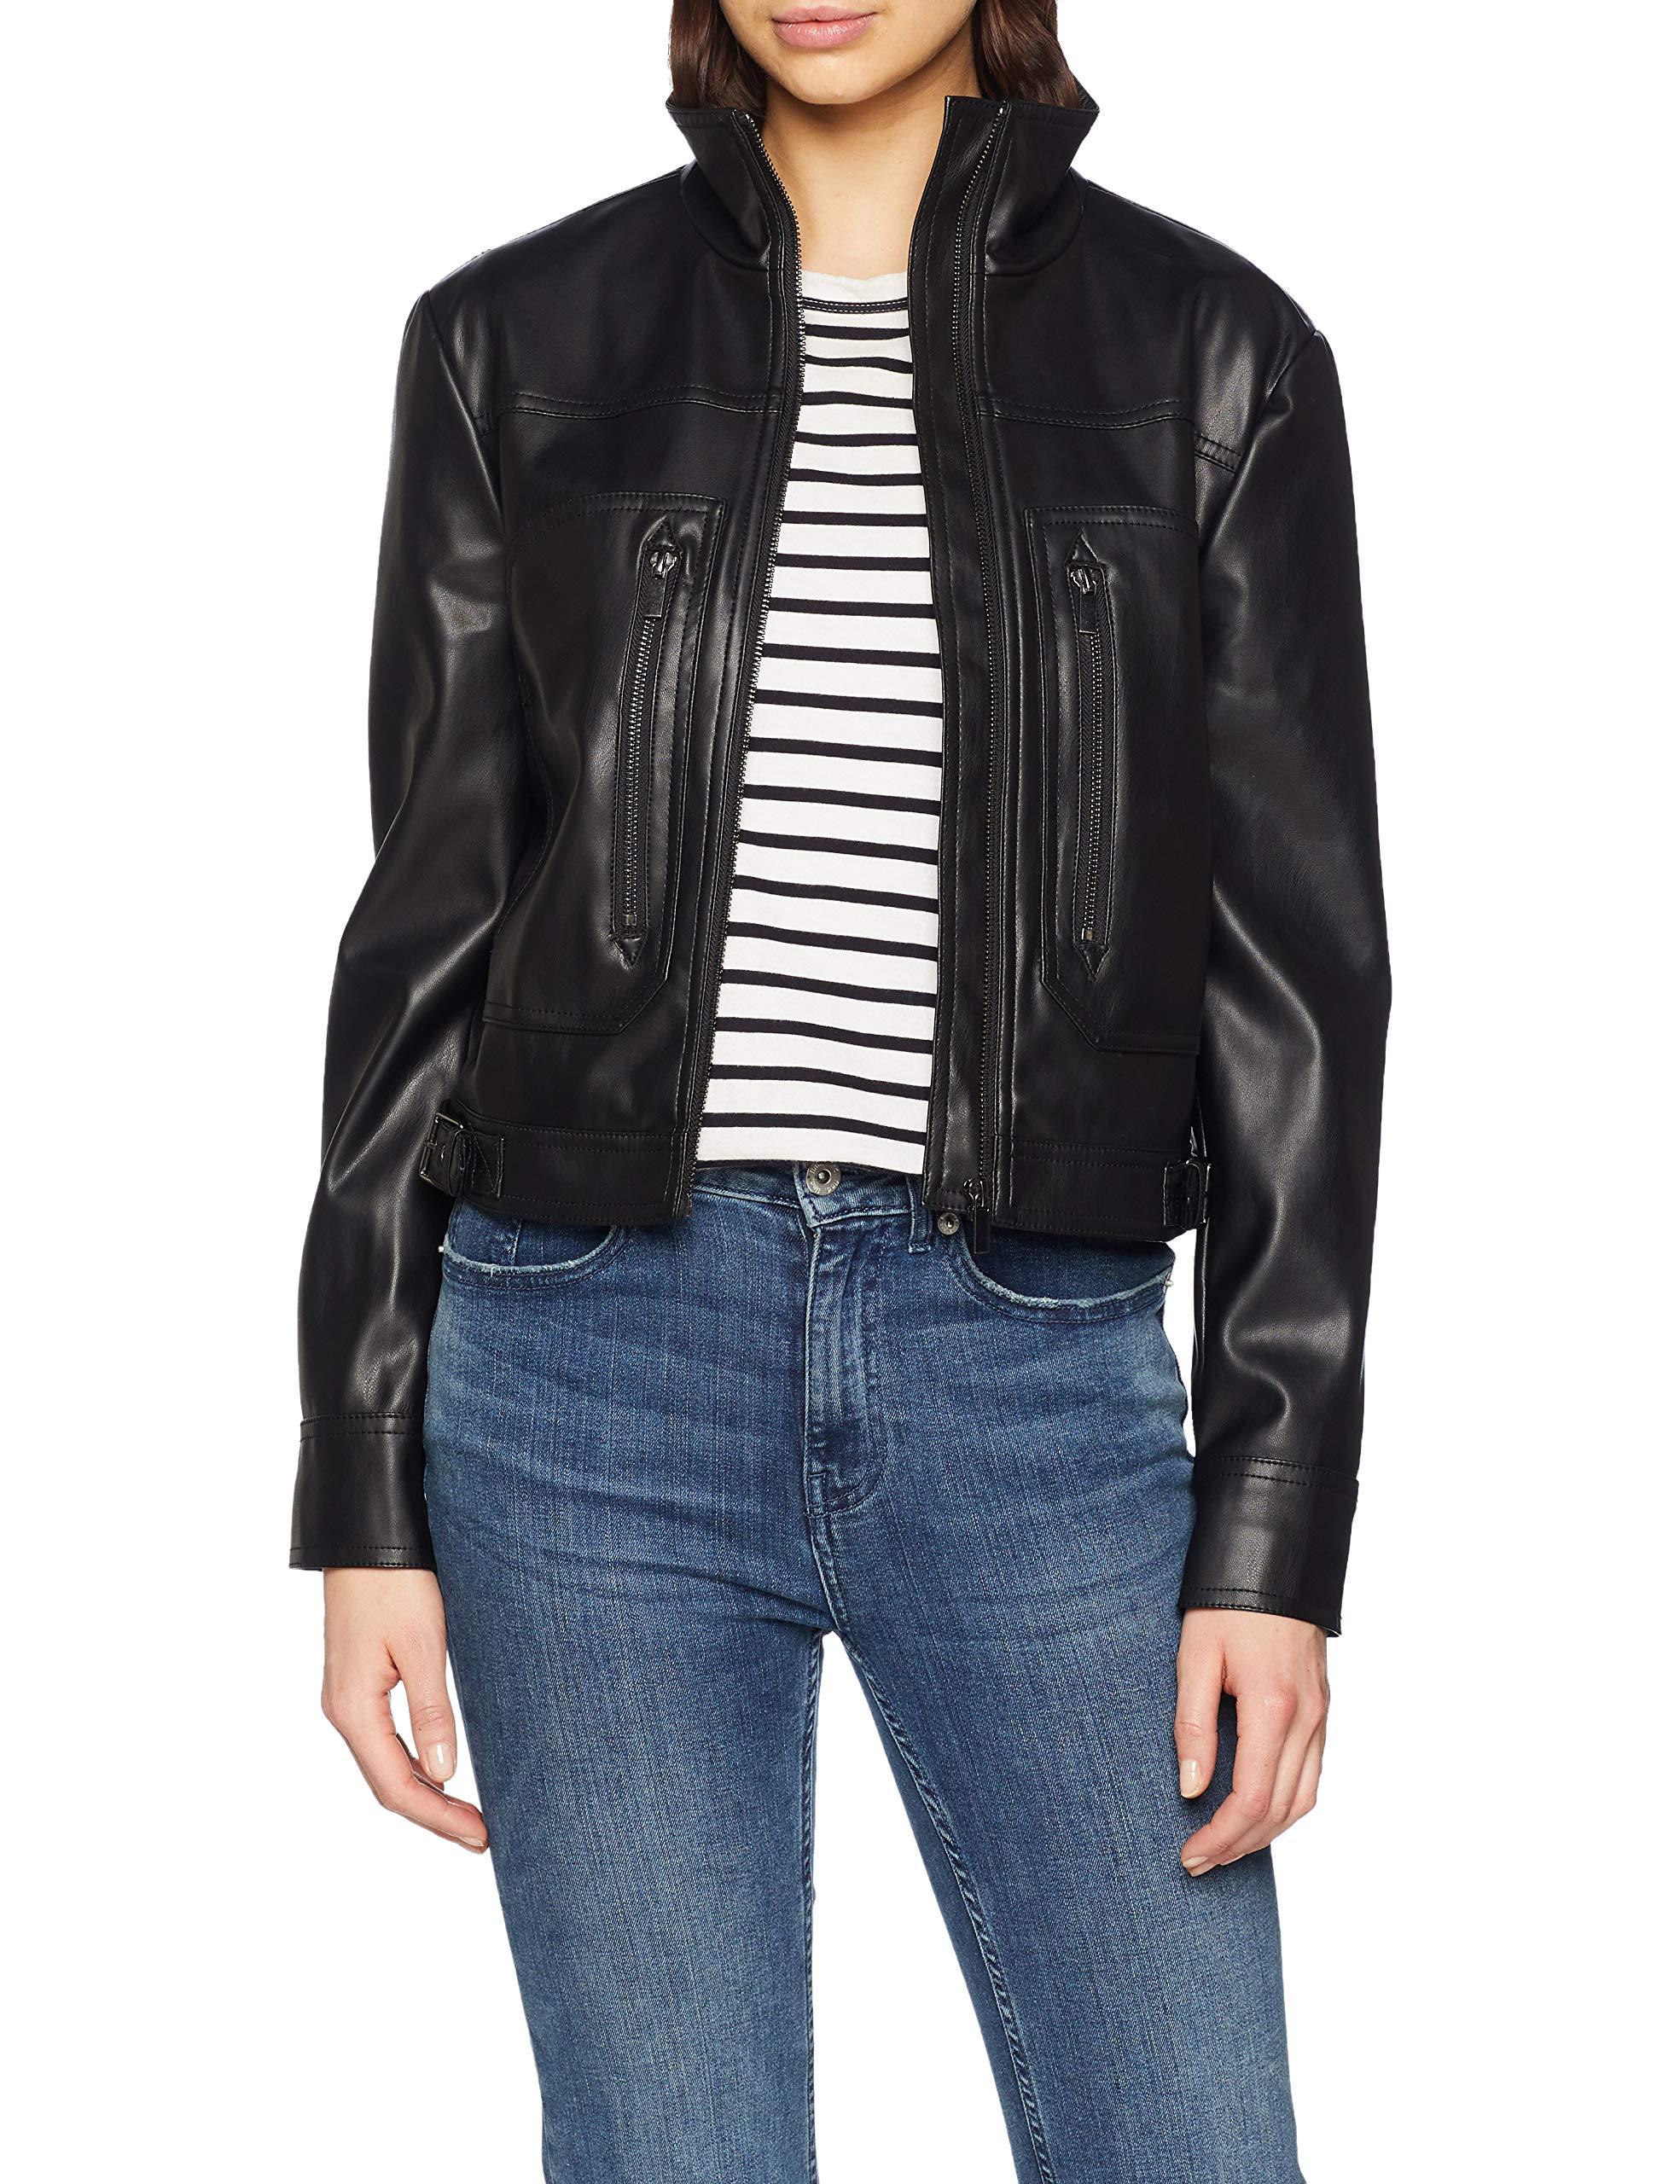 Jacket 10044taille BlousonNoirblack Sisley Jacket Fabricant42Femme Sisley BlousonNoirblack 2ED9IeHWYb